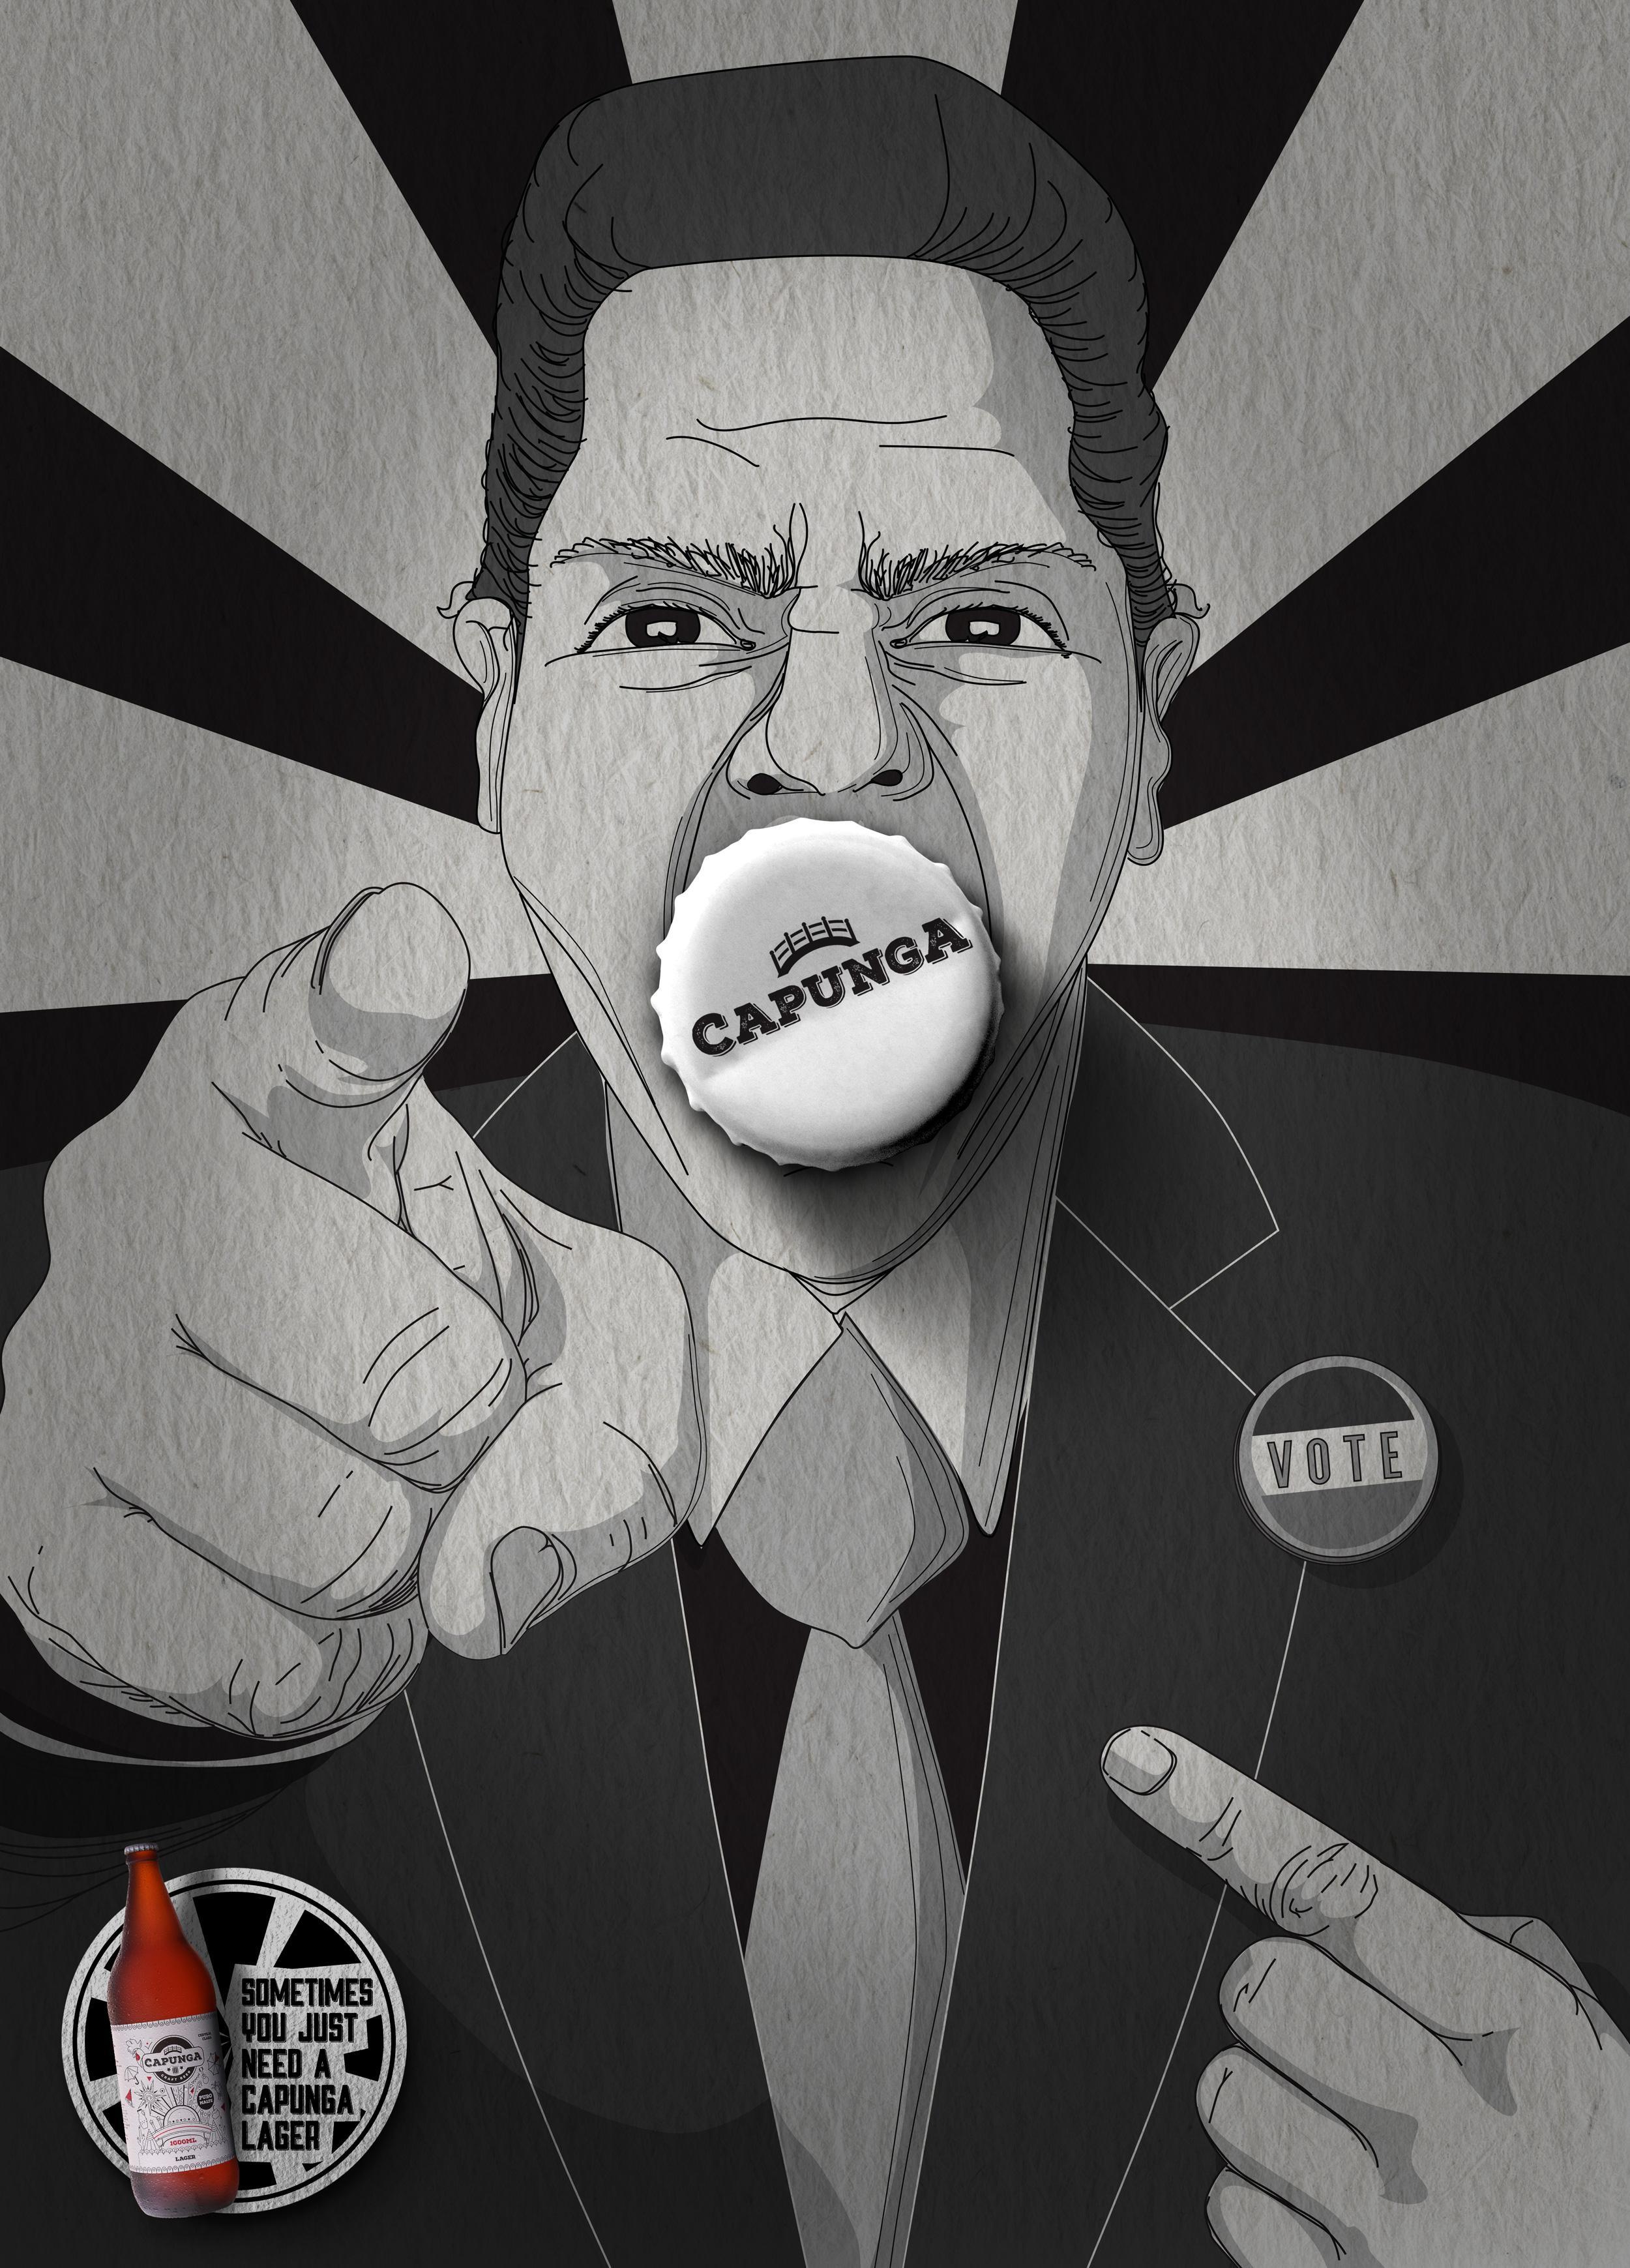 Capunga Craft Beer Print Ad - Politician